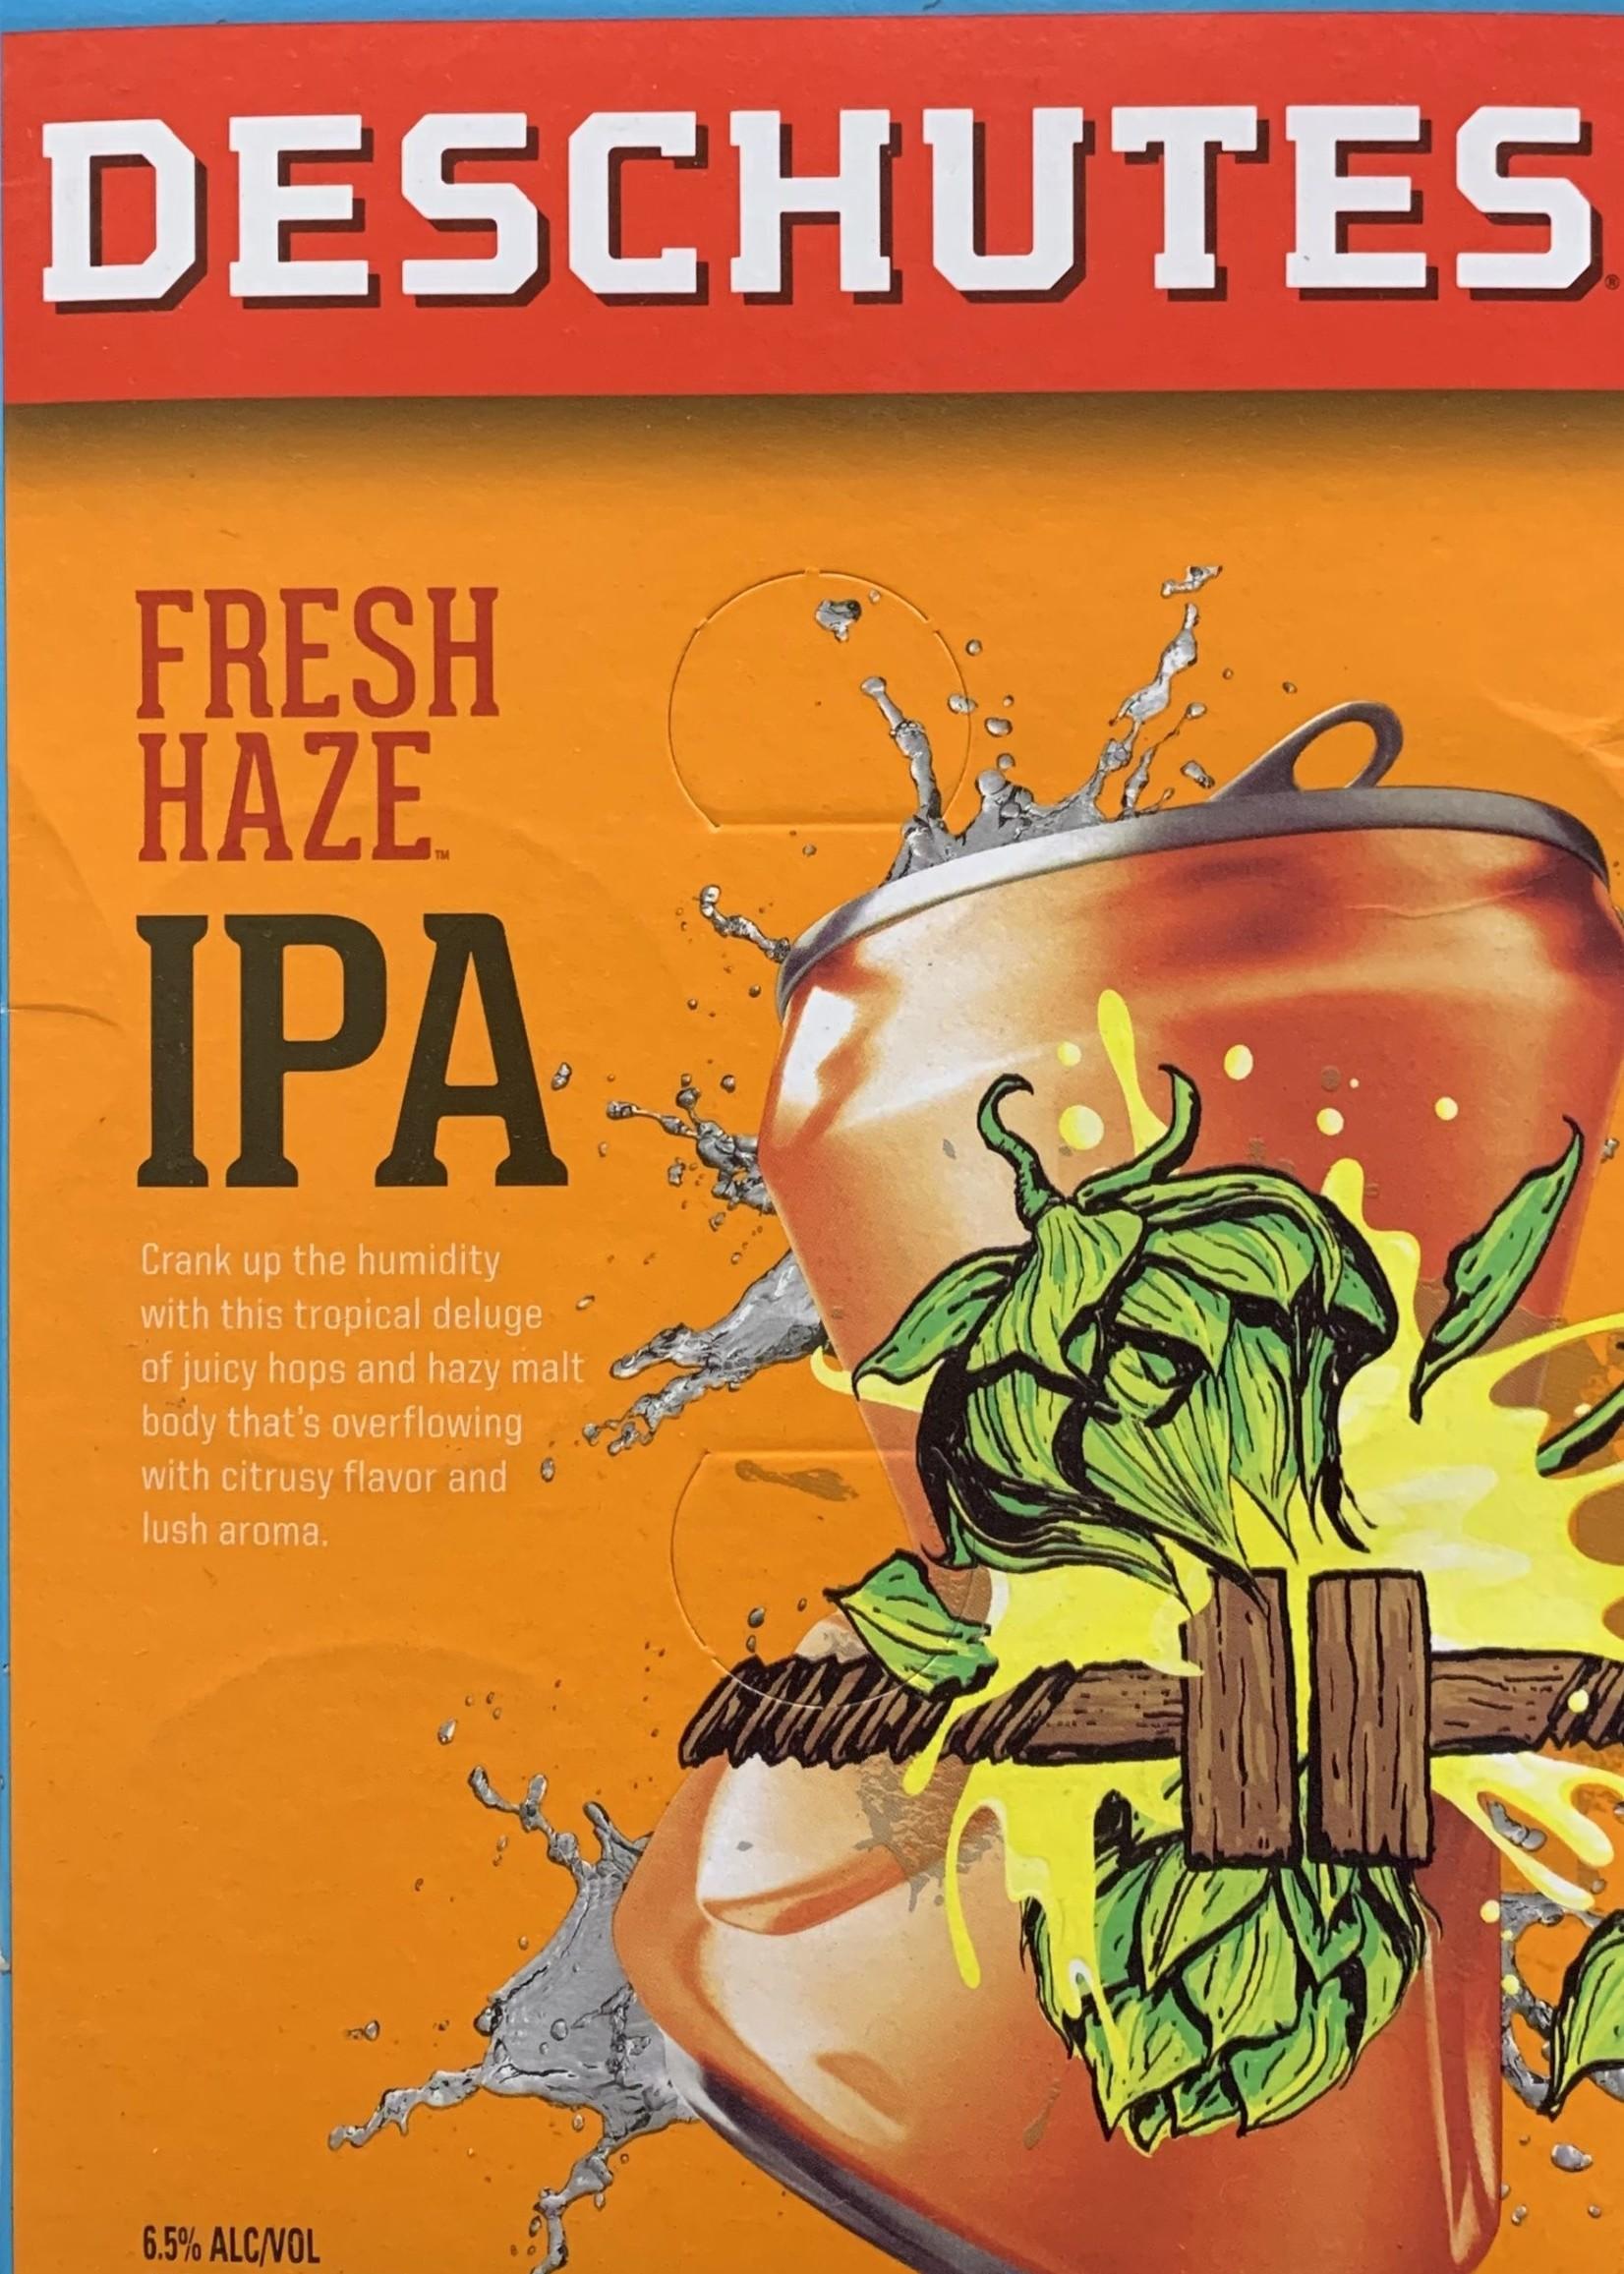 Deschutes Fresh Haze IPA 6 Cans